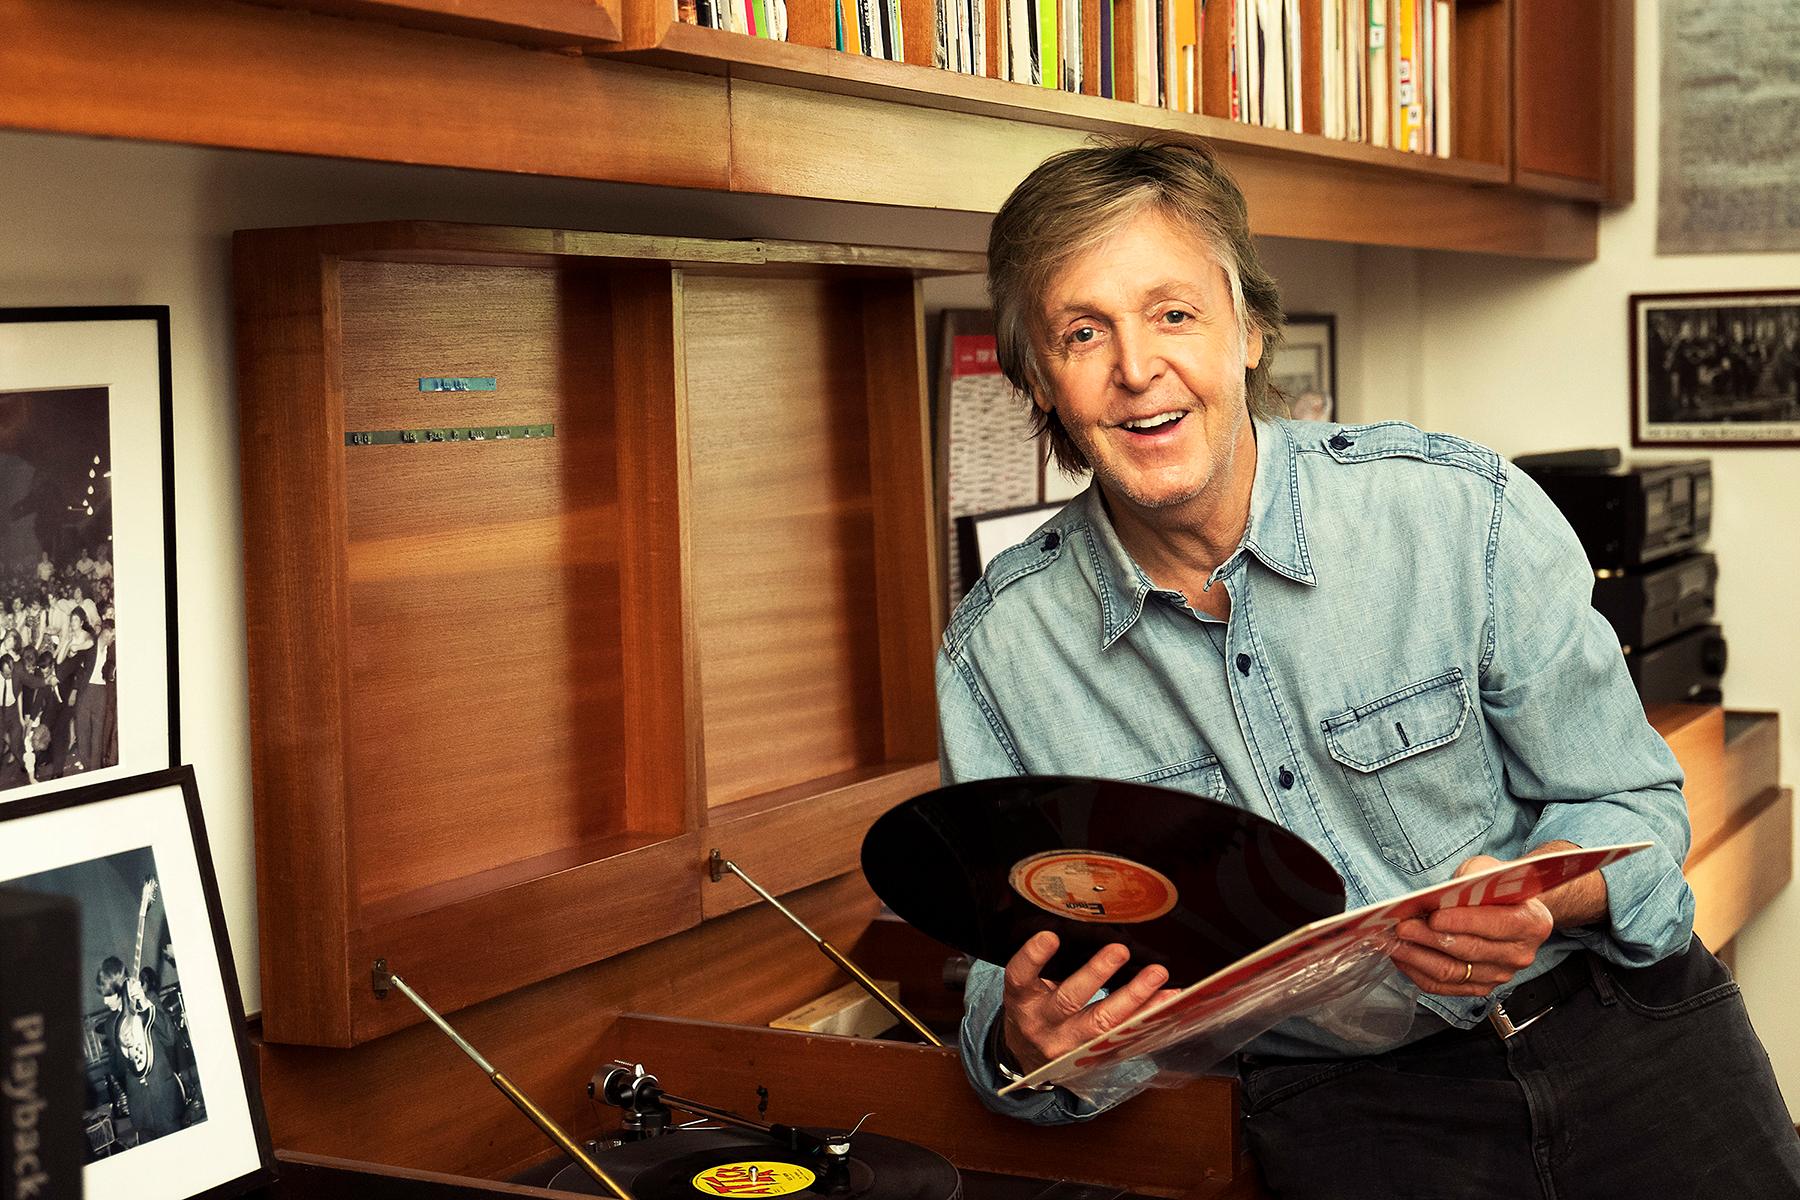 Paul McCartney Announces 'The Lyrics: 1956 to the Present' Memoir